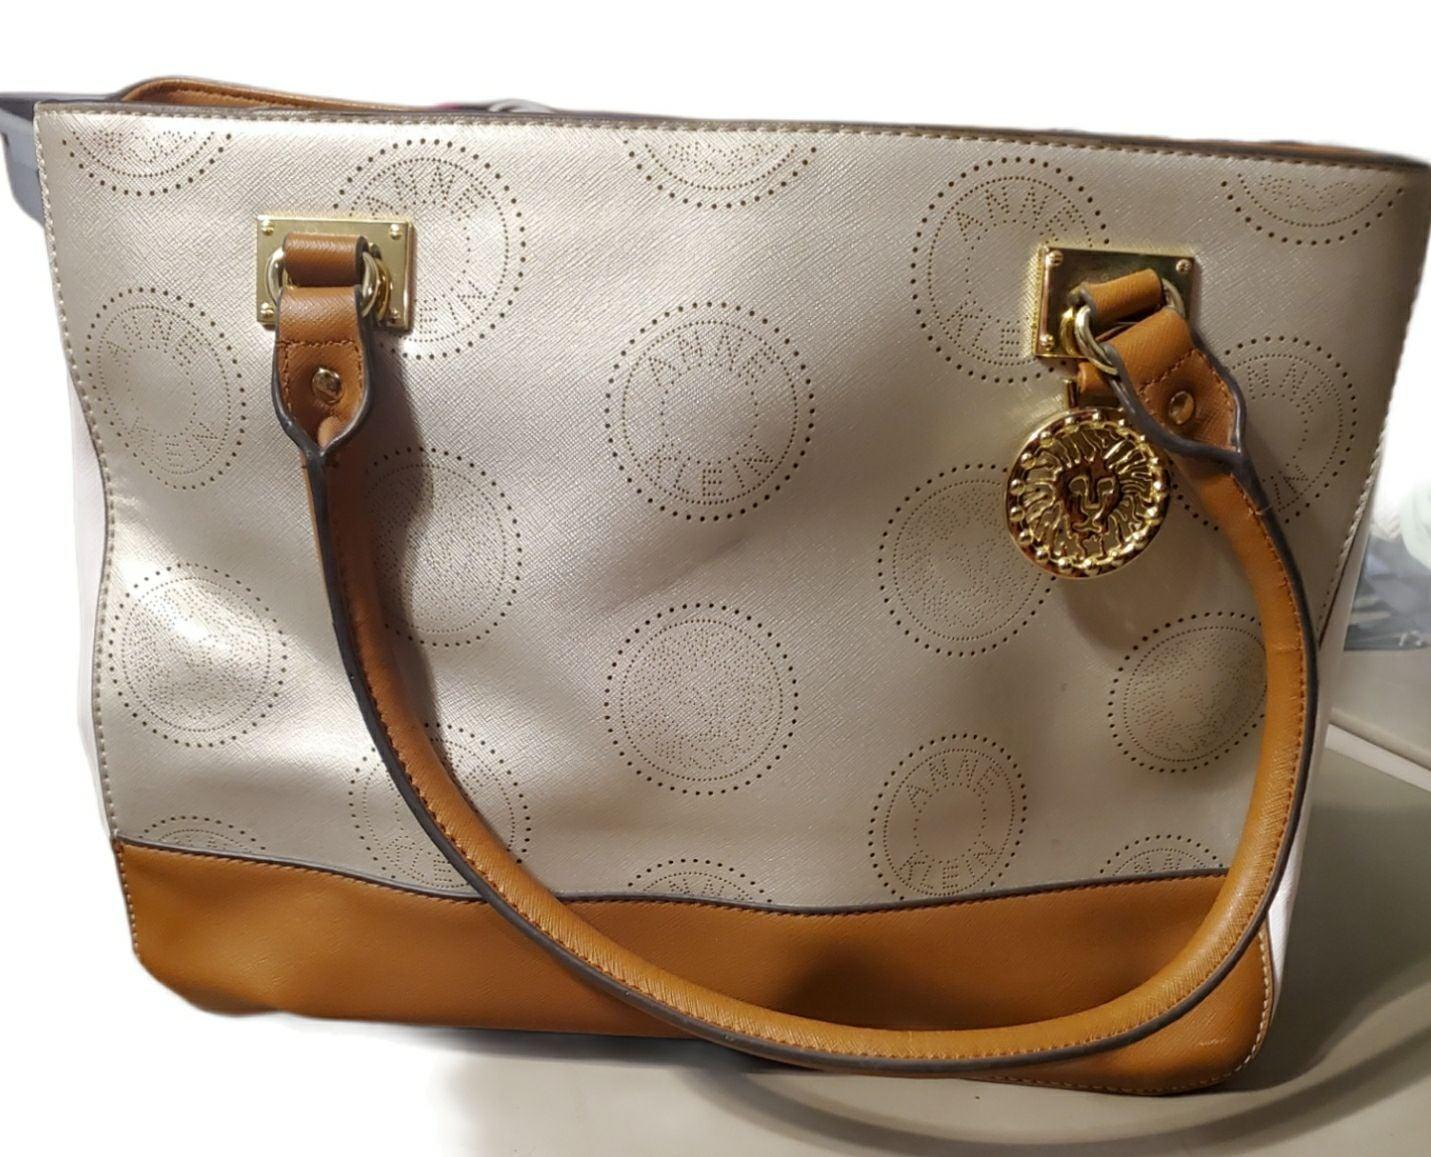 Anne Klein tote purse